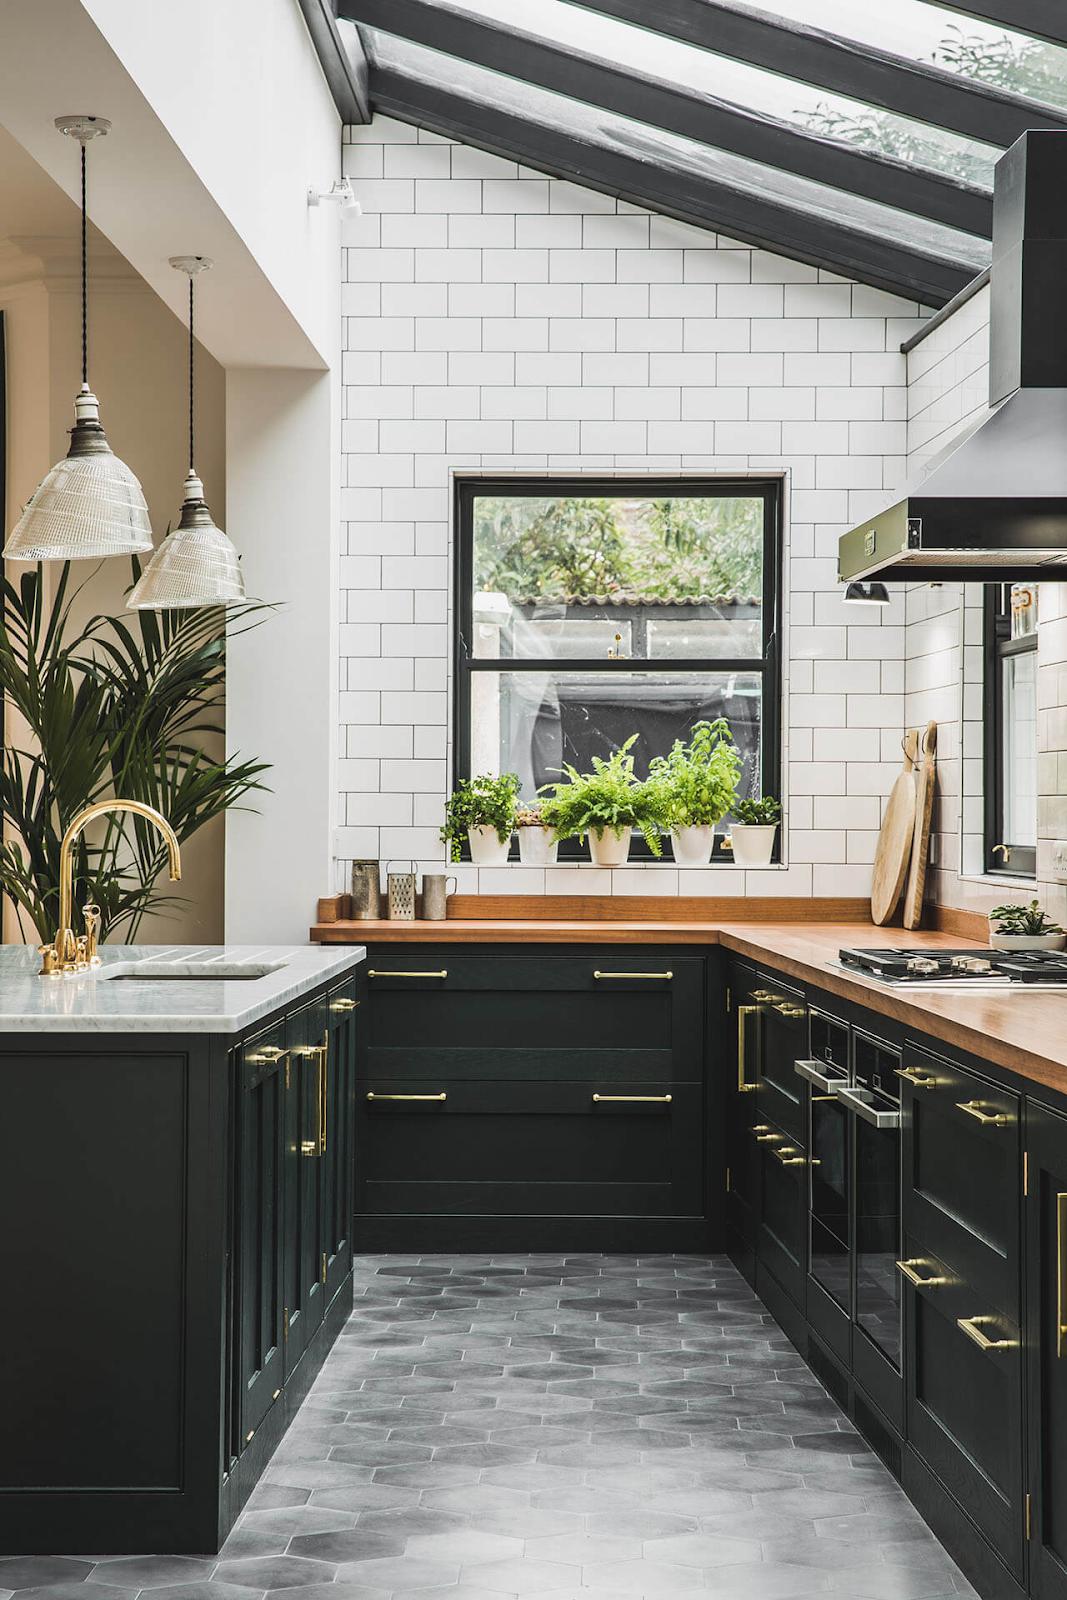 kitchen with skylits, plants, dark green shaker cabinets and white backsplash